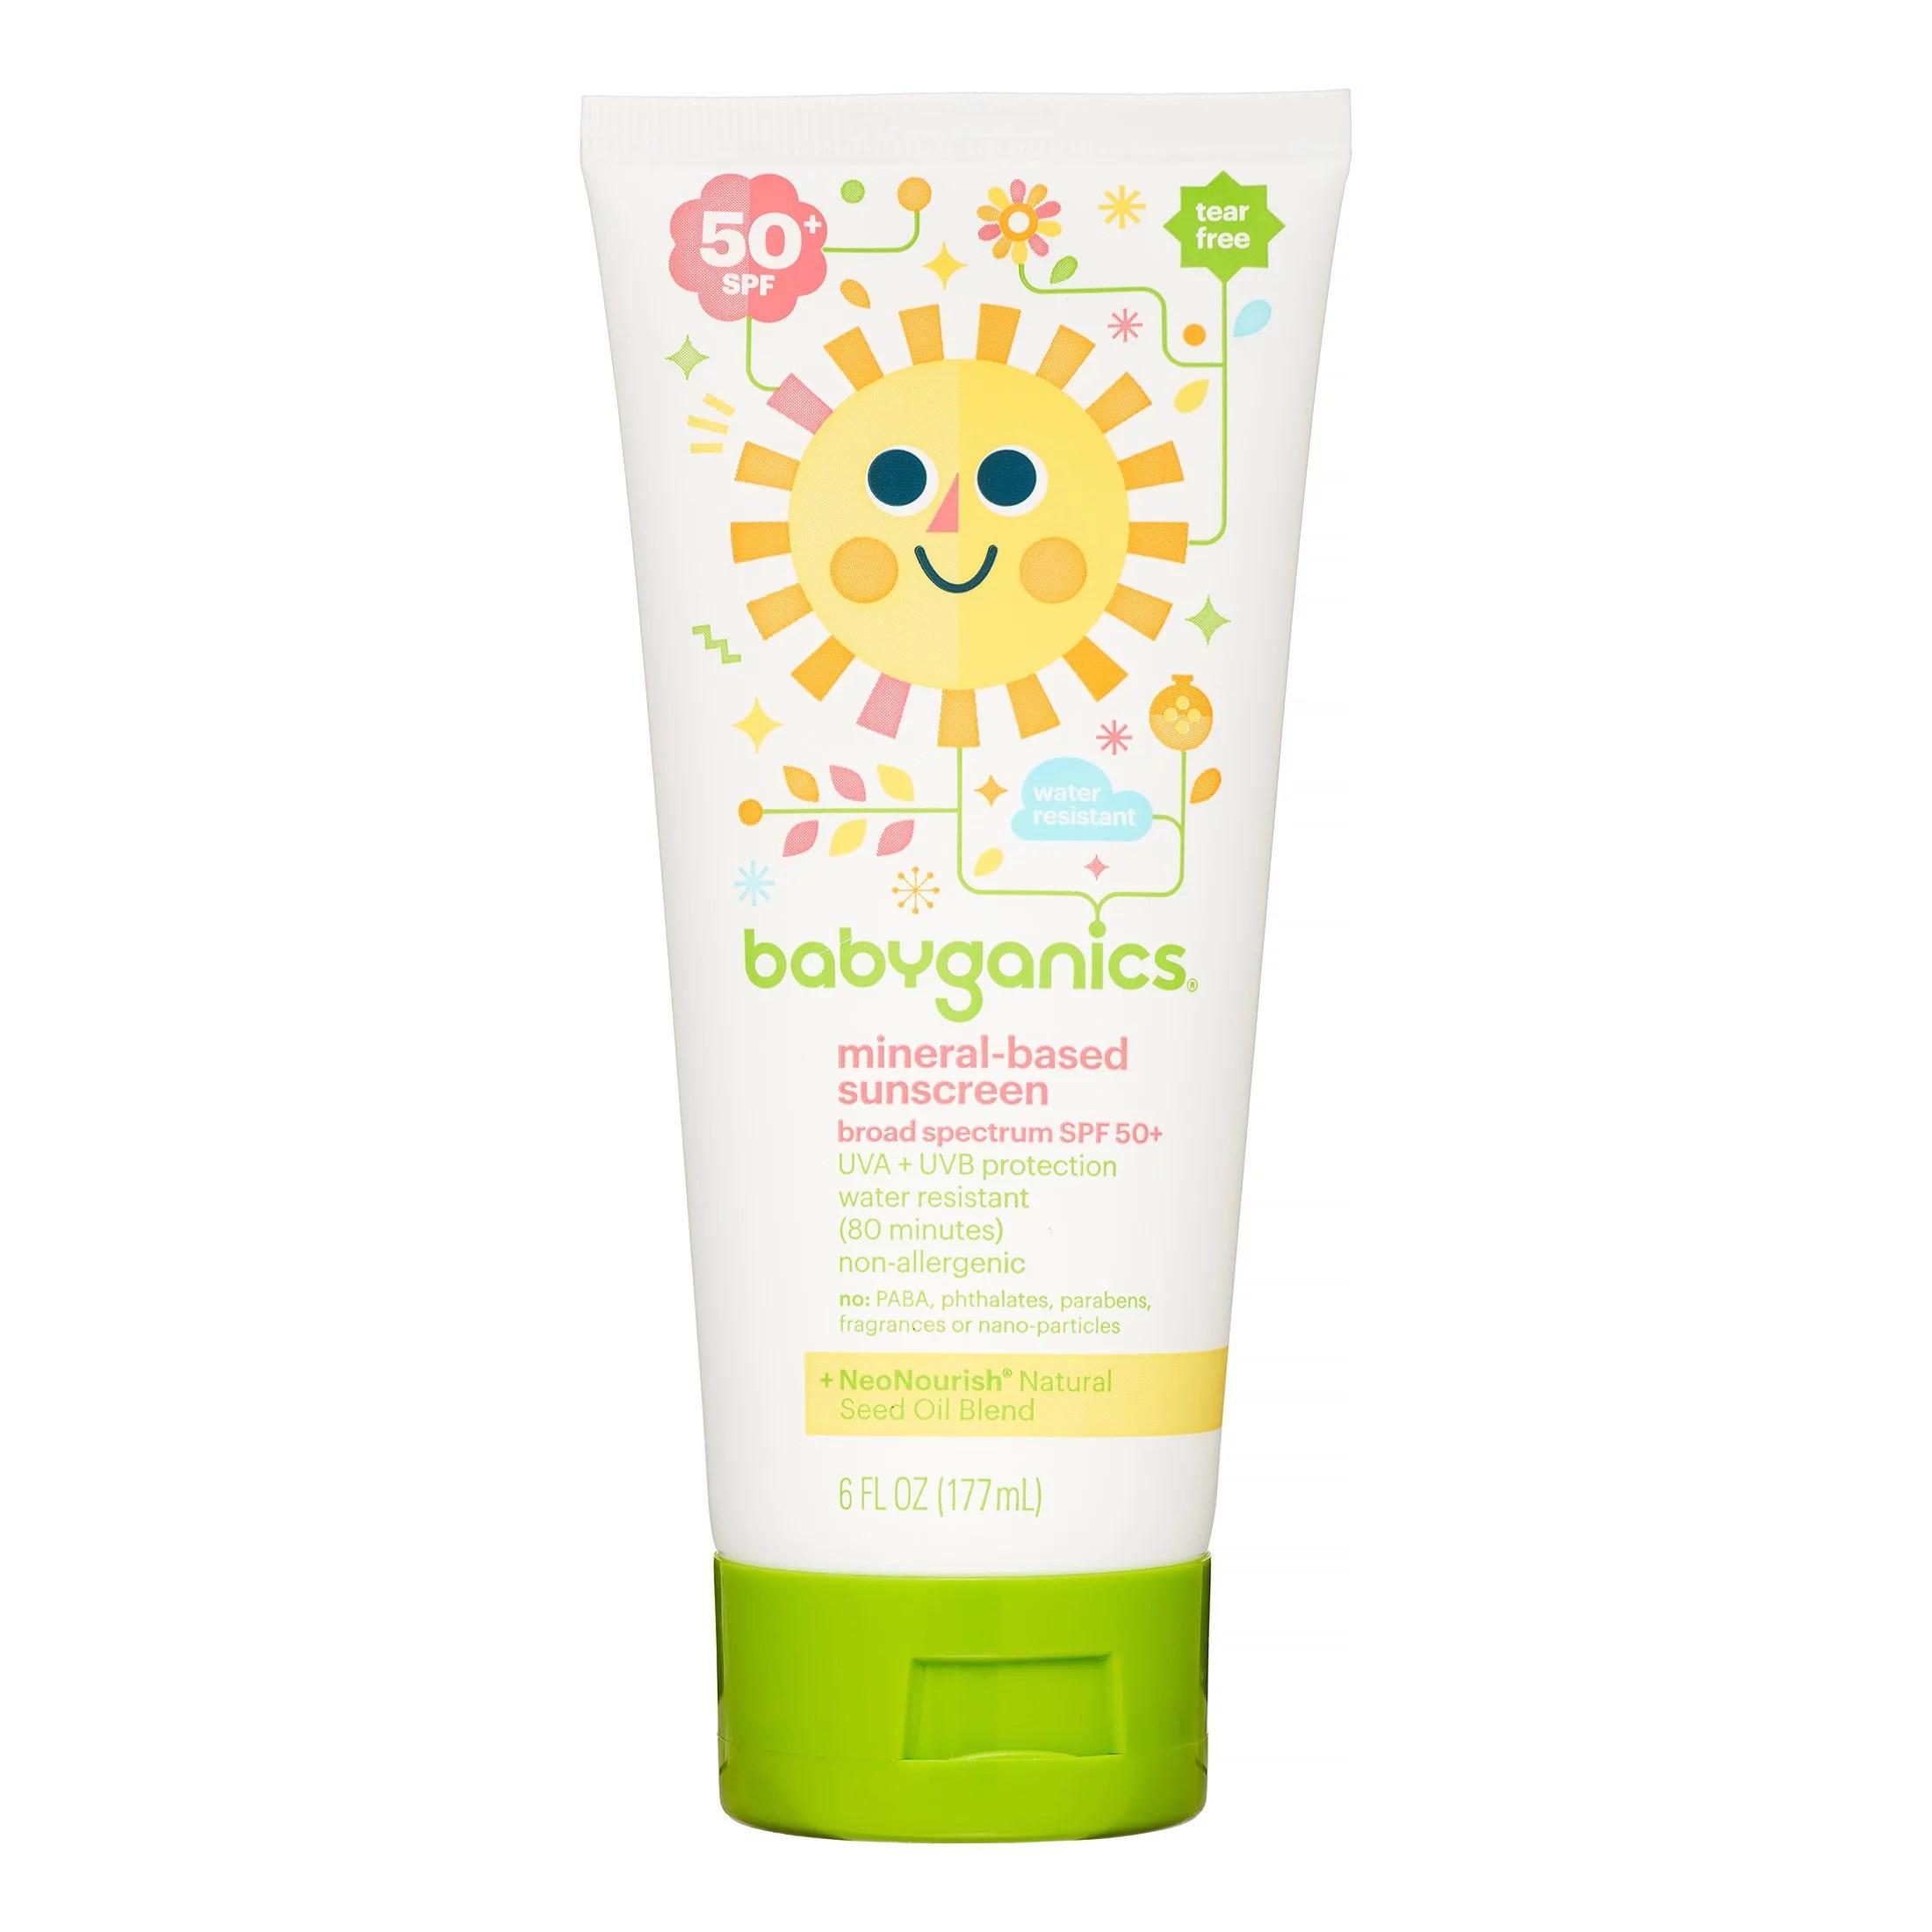 Babyganics Mineral-Based Baby Sunscreen Lotion, SPF 50, 6 Fl Oz